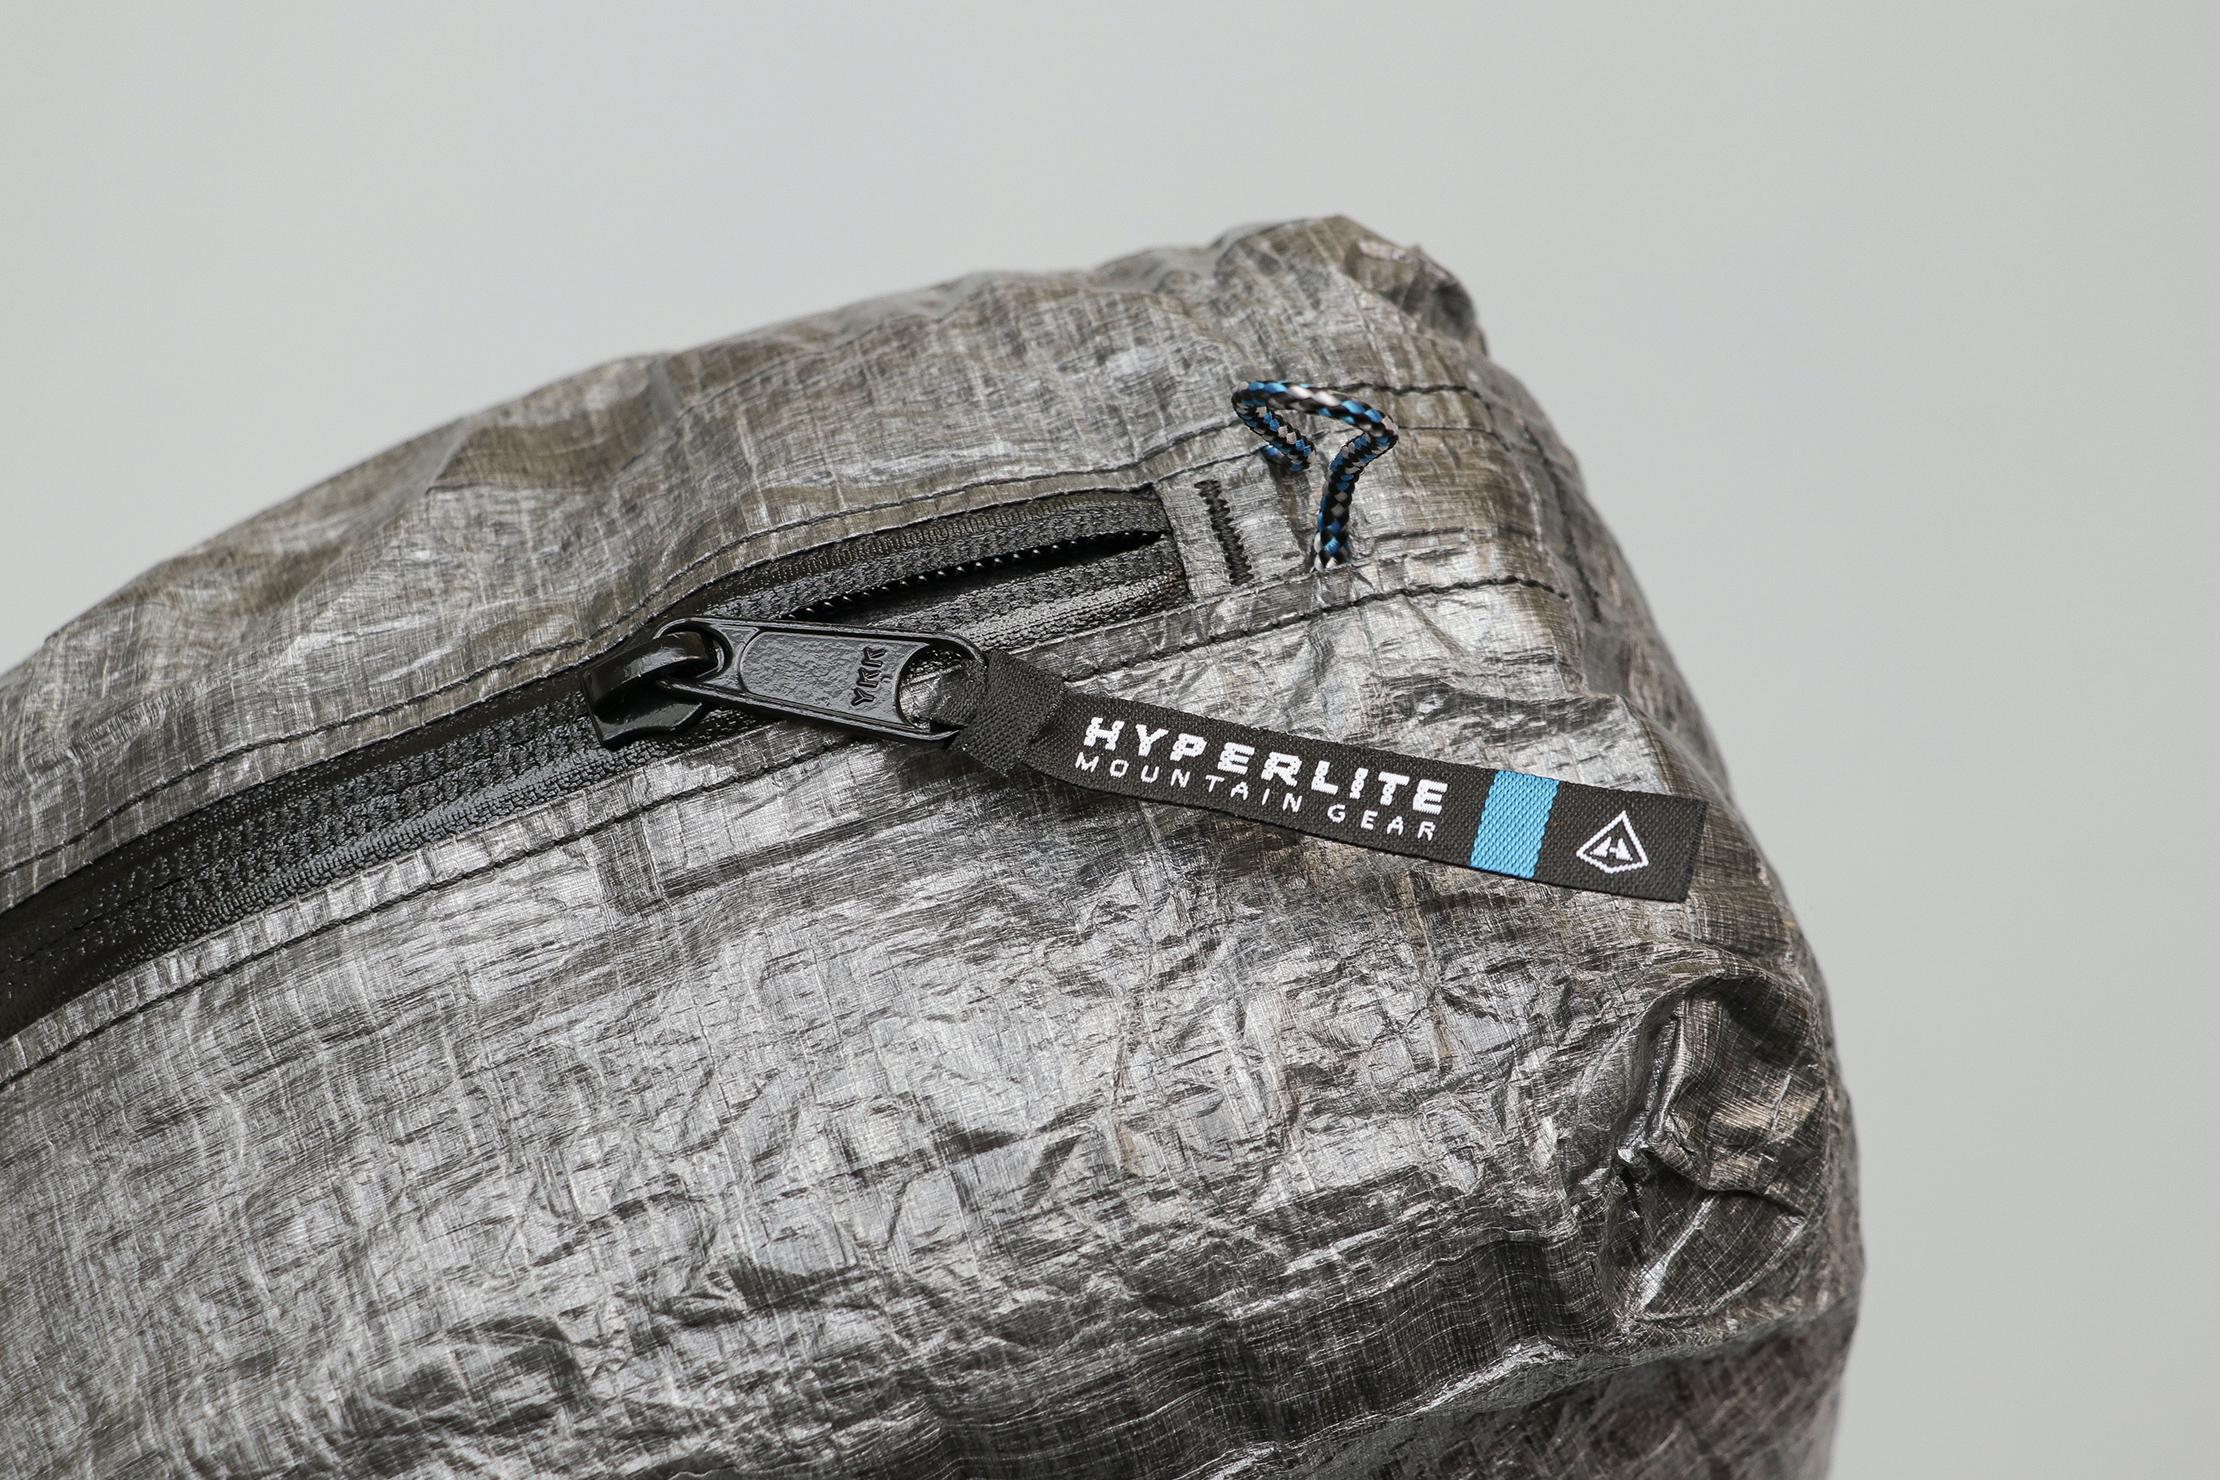 Hyperlite Mountain Gear Pod Zipper And Pull Tabs